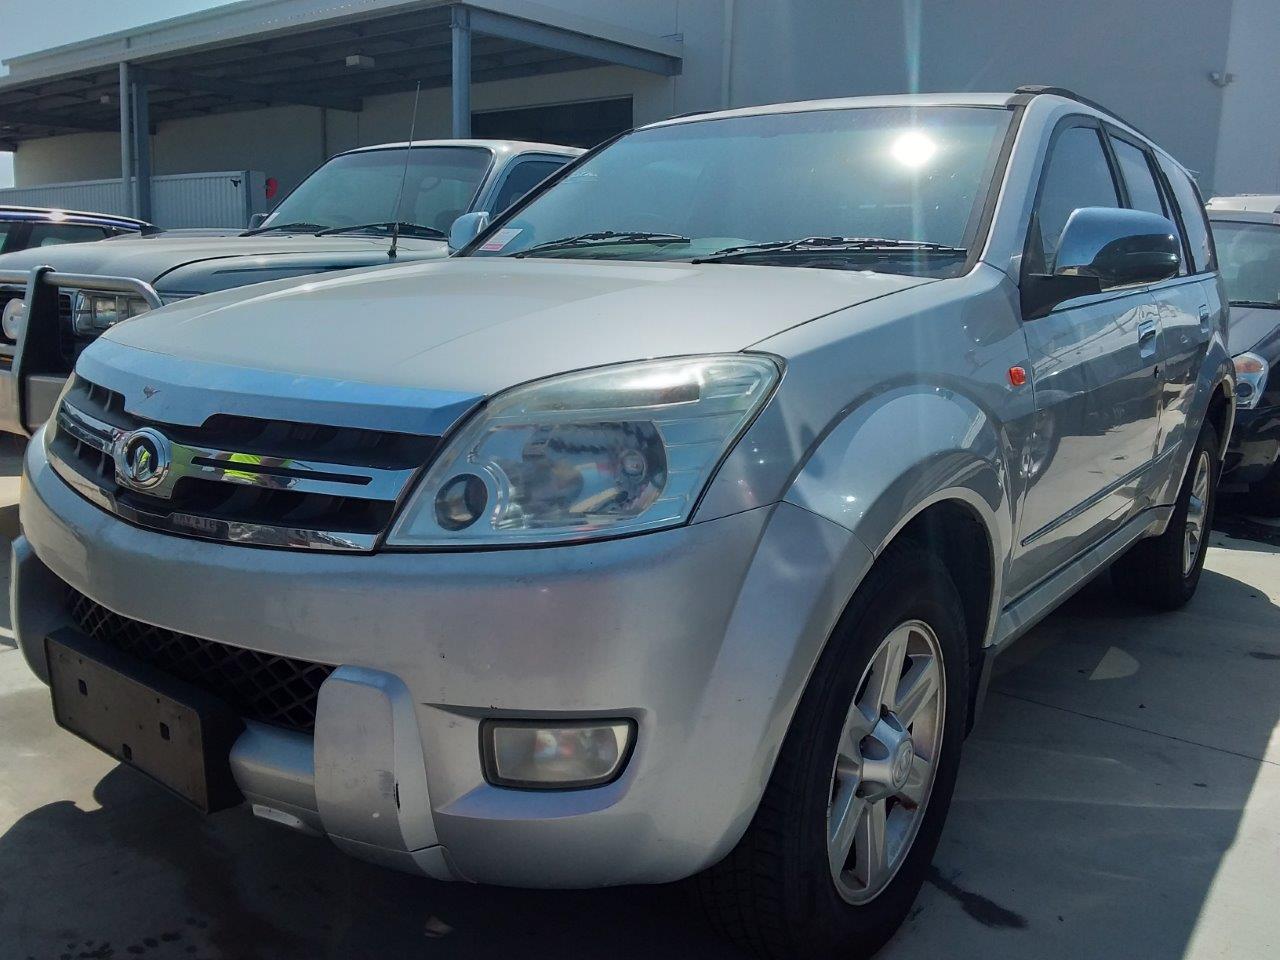 2006 Great Wall X240 4WD Wagon